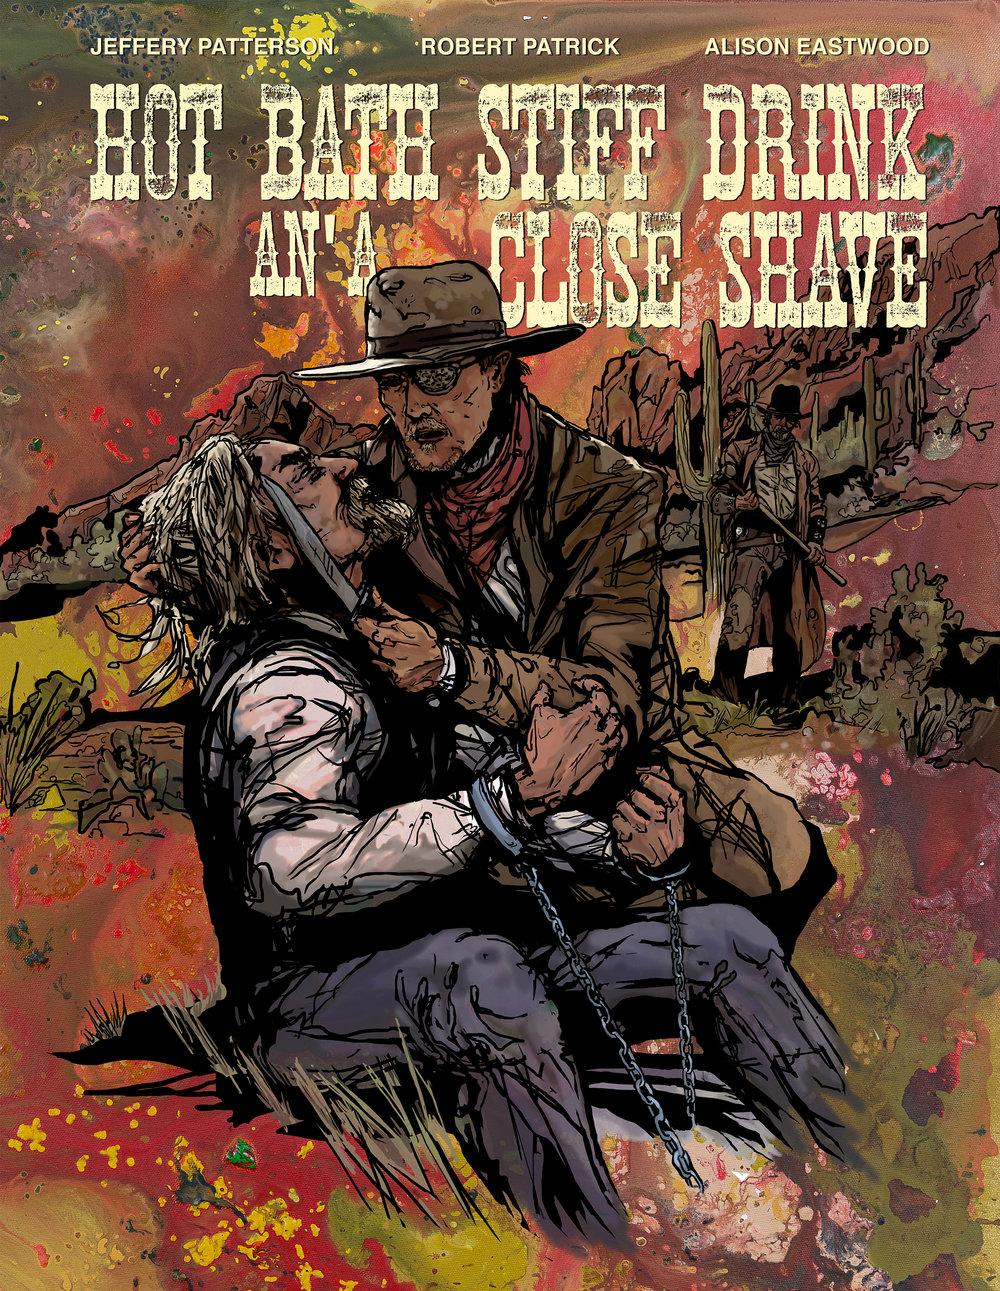 HBSD2-Posterfront.jpg